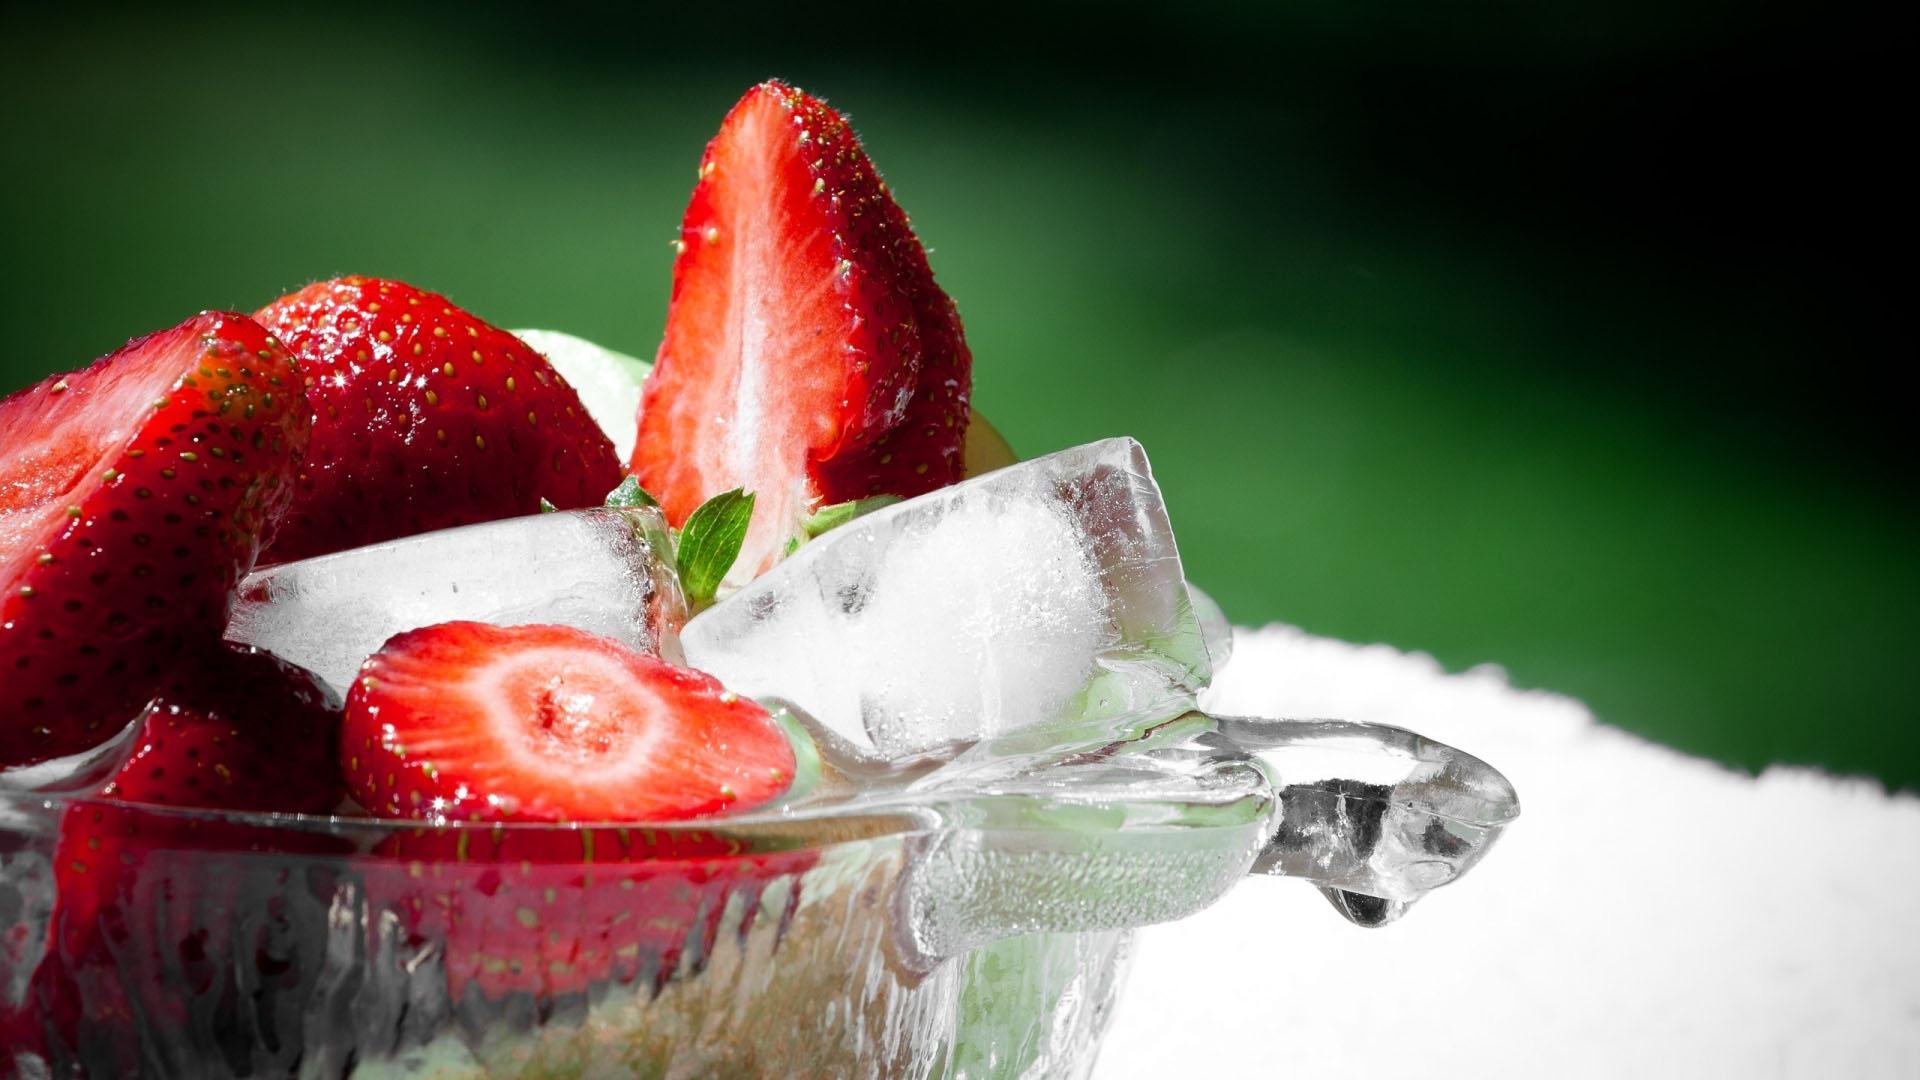 strawberries wallpaper 38846